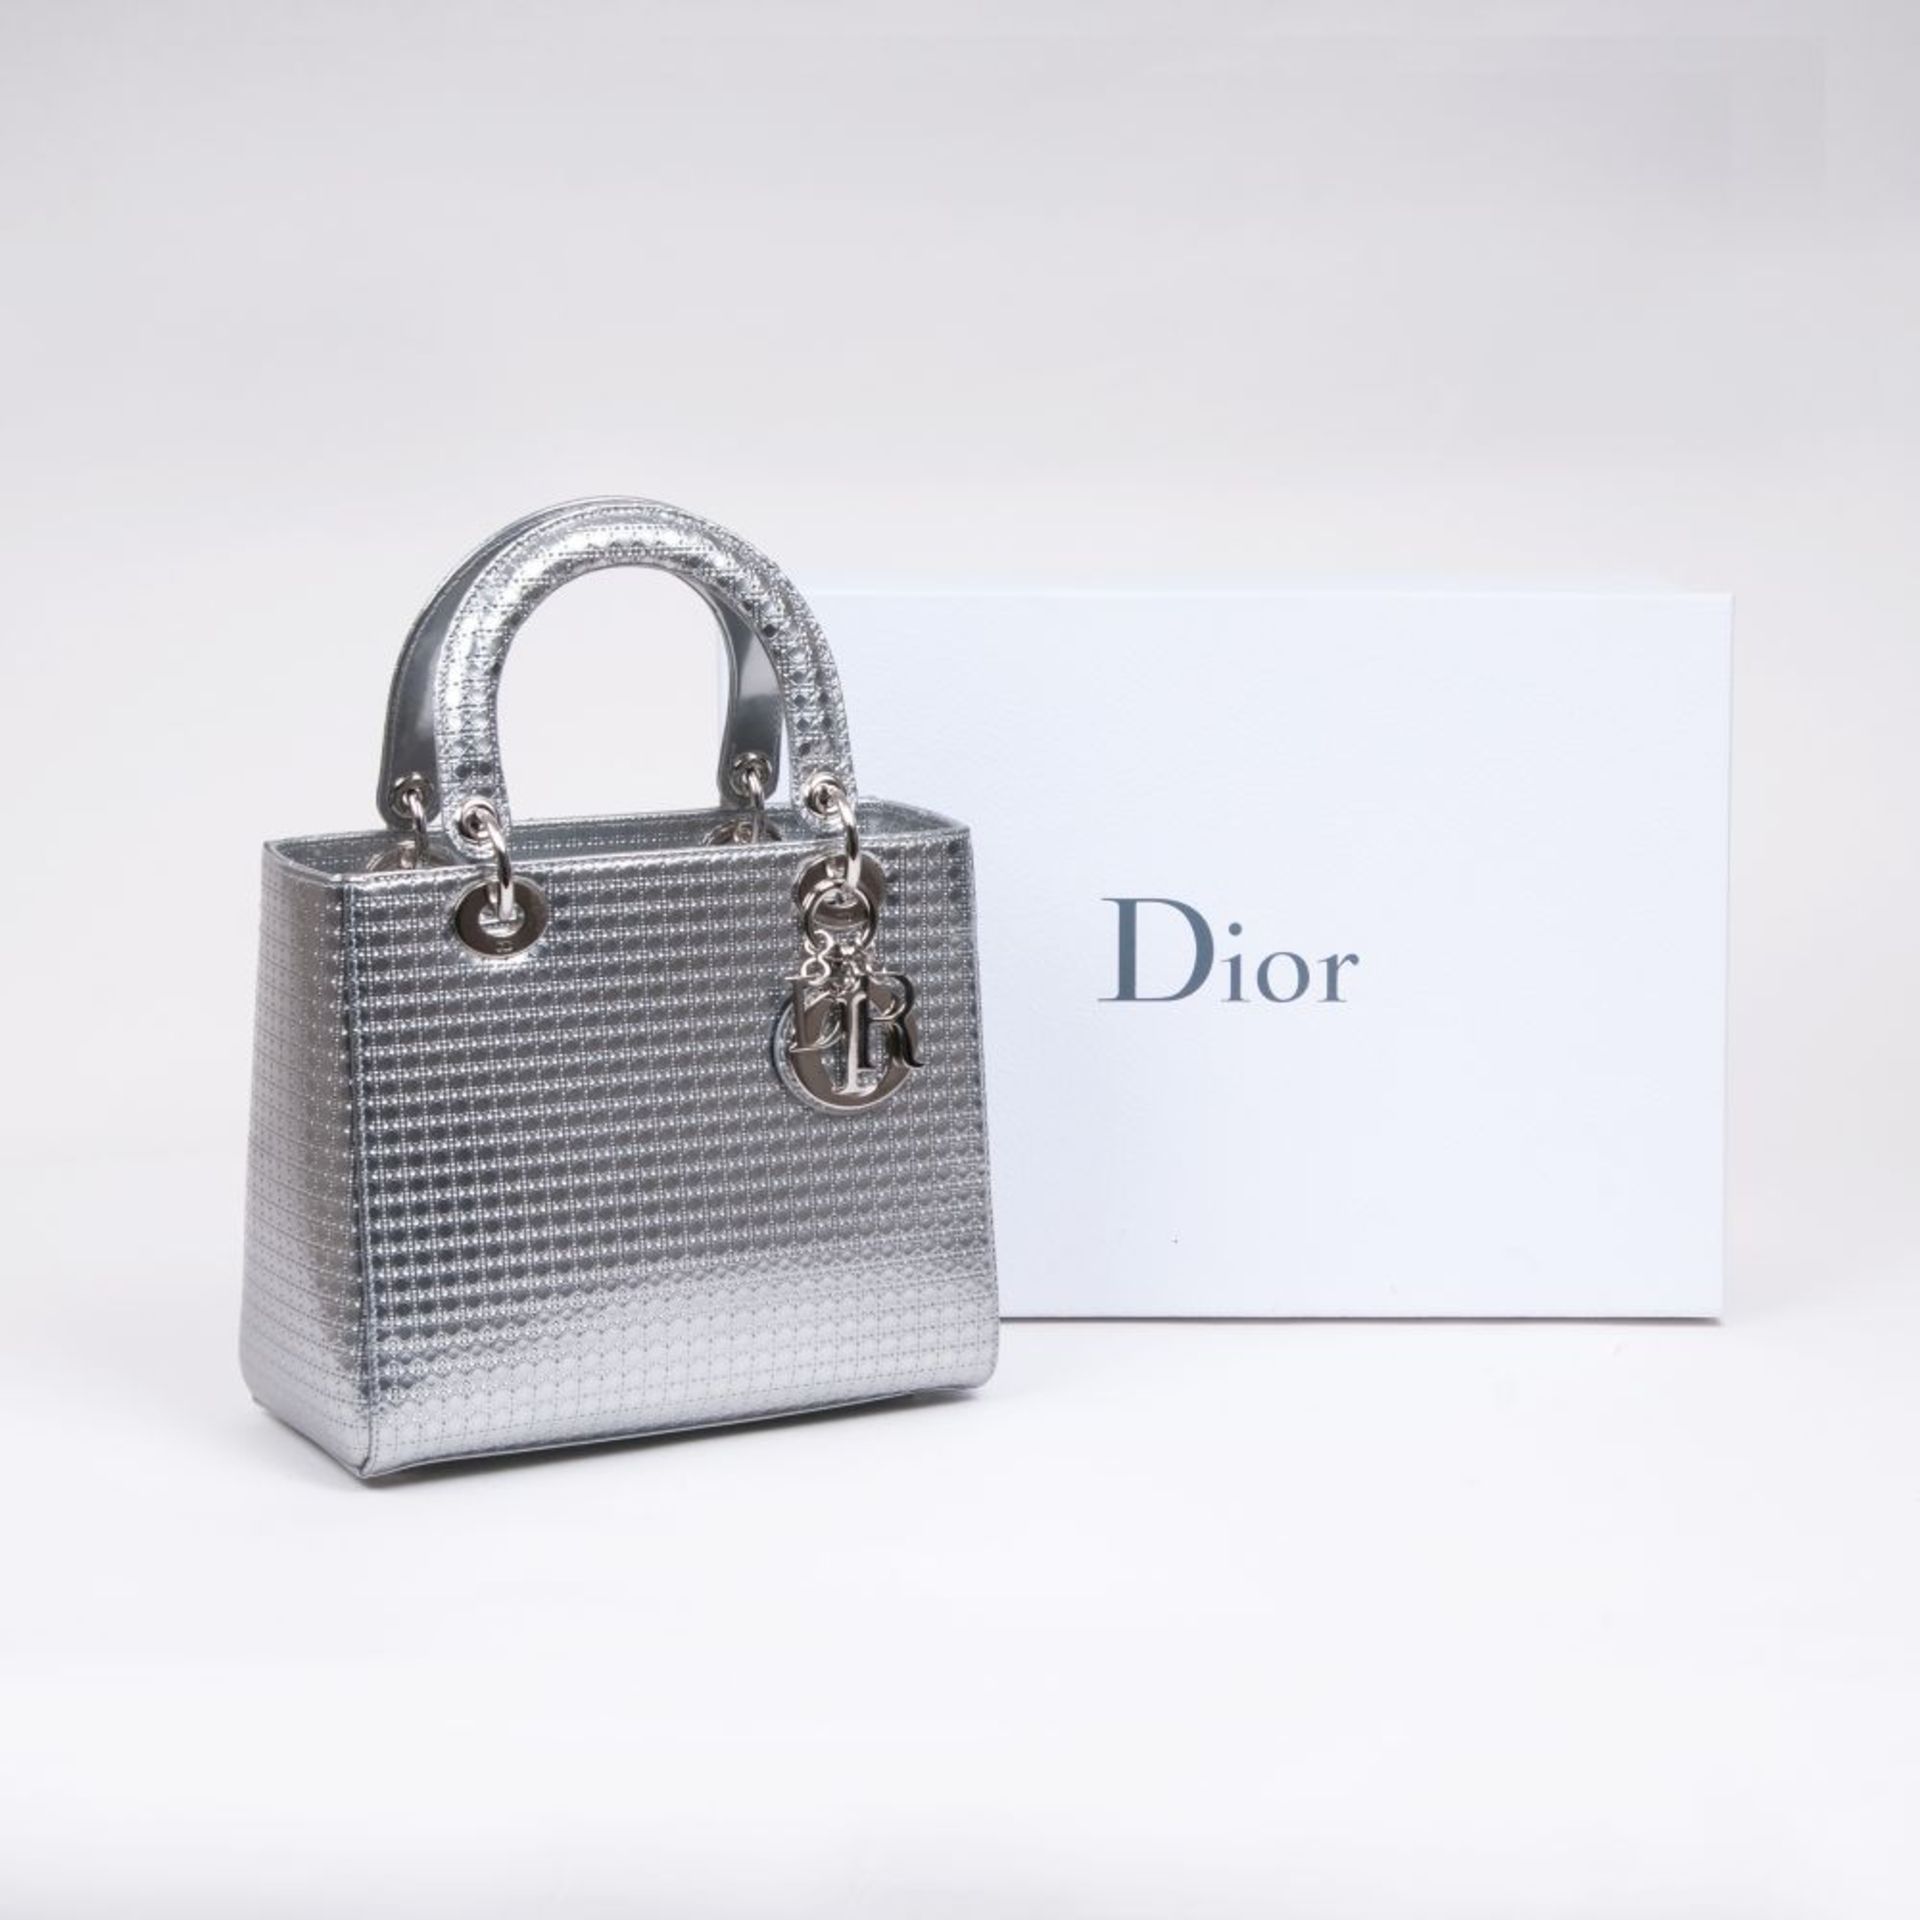 Christian Dior. Lady Dior Bag Silver Perforated. - Bild 2 aus 2